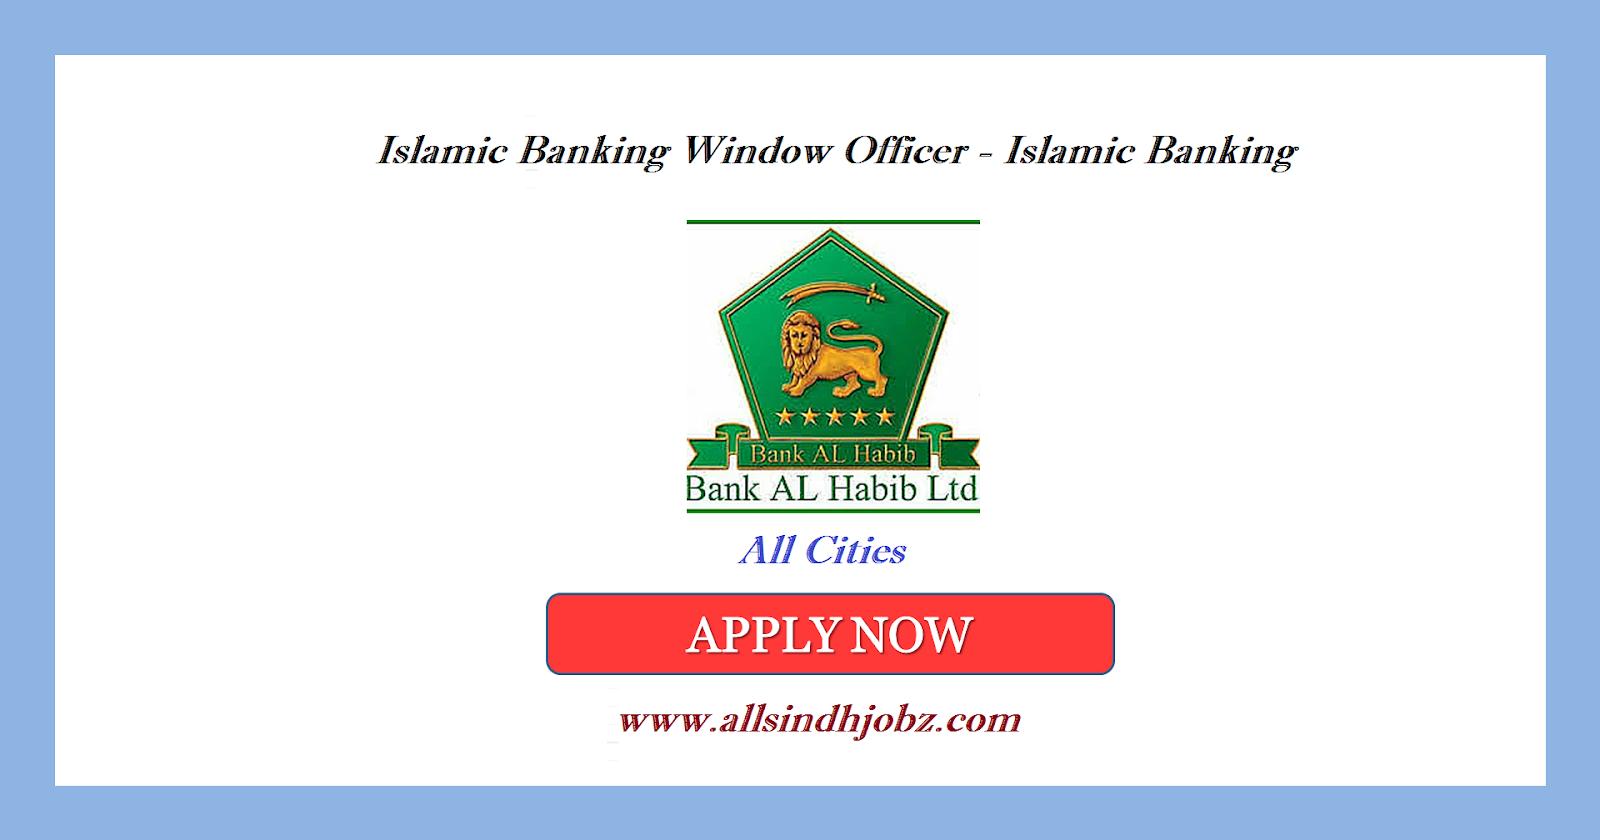 Bank Al Habib Jobs of Islamic Banking Window Officer - Islamic Banking 2019 Latest